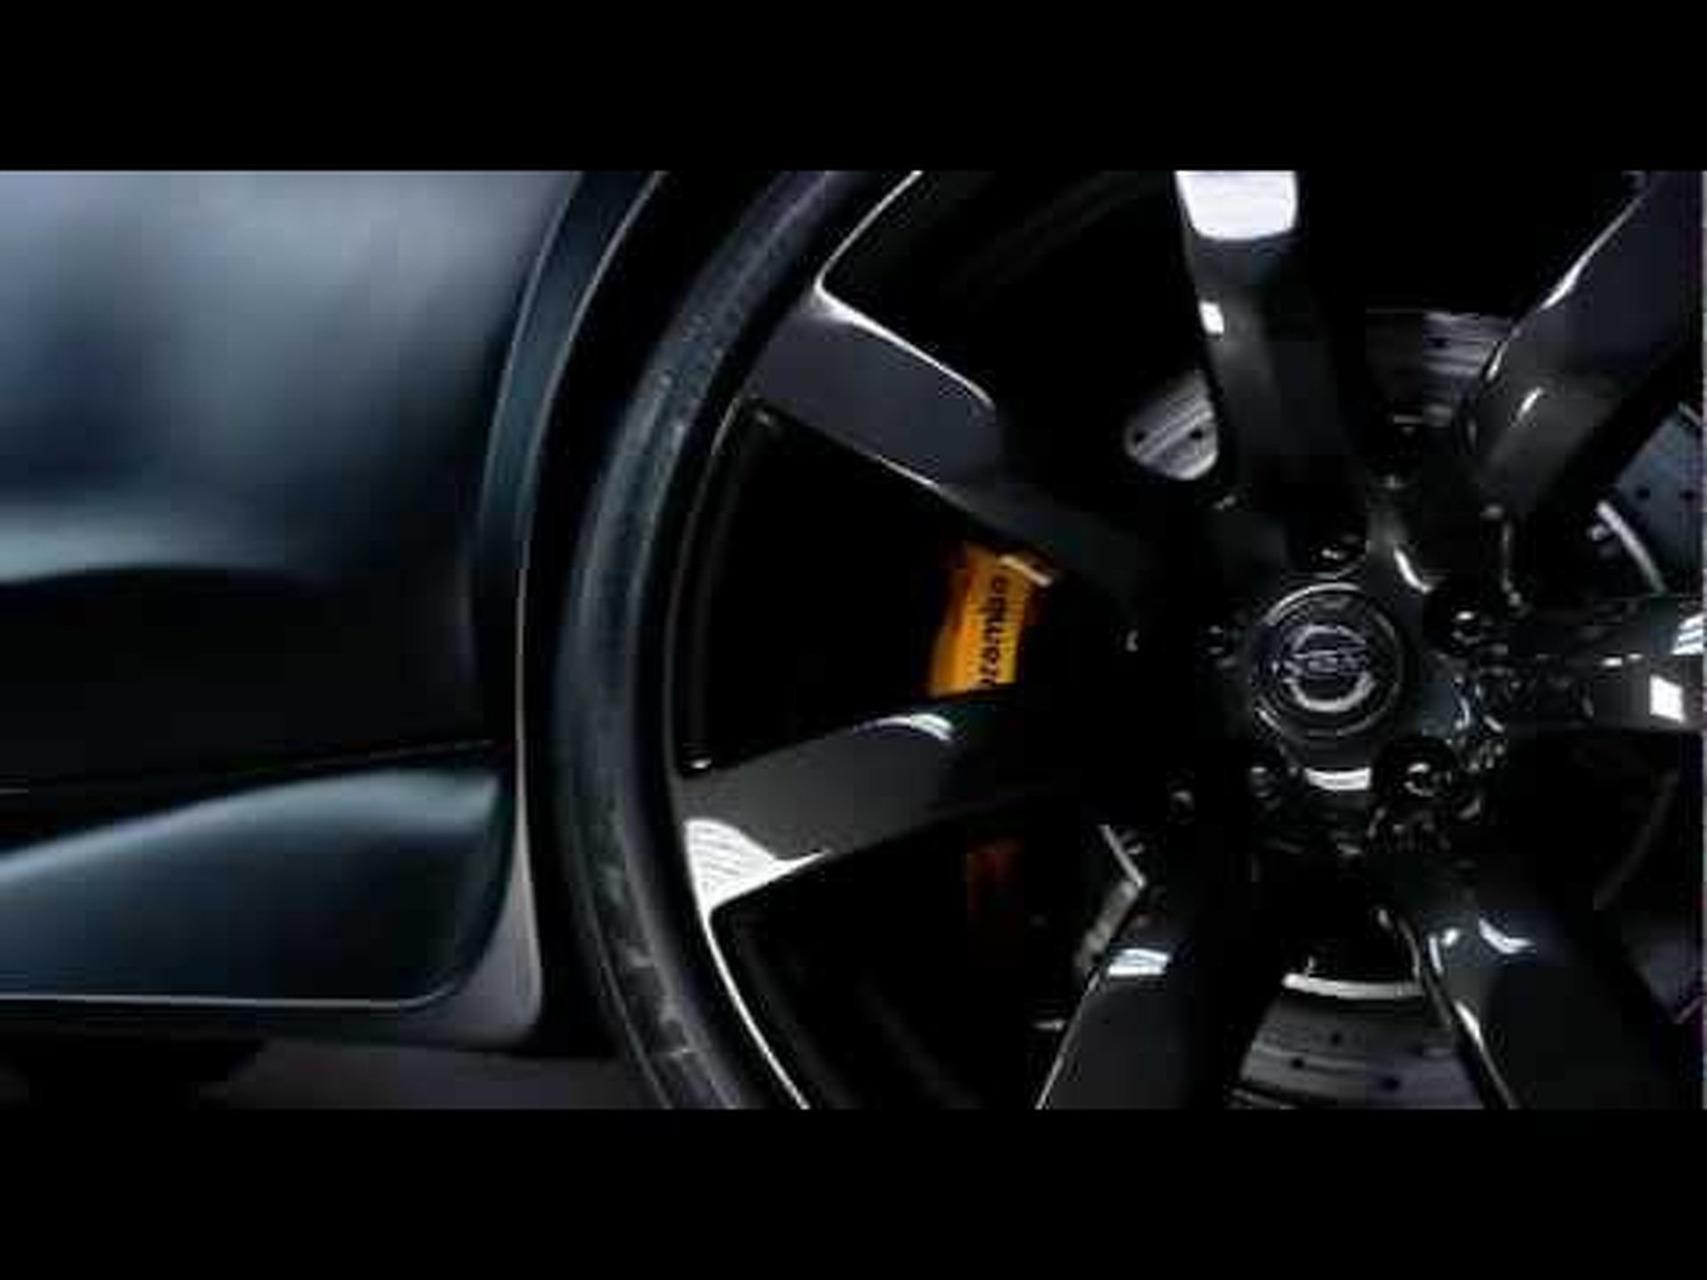 2011 Nissan Juke-R Concept Static